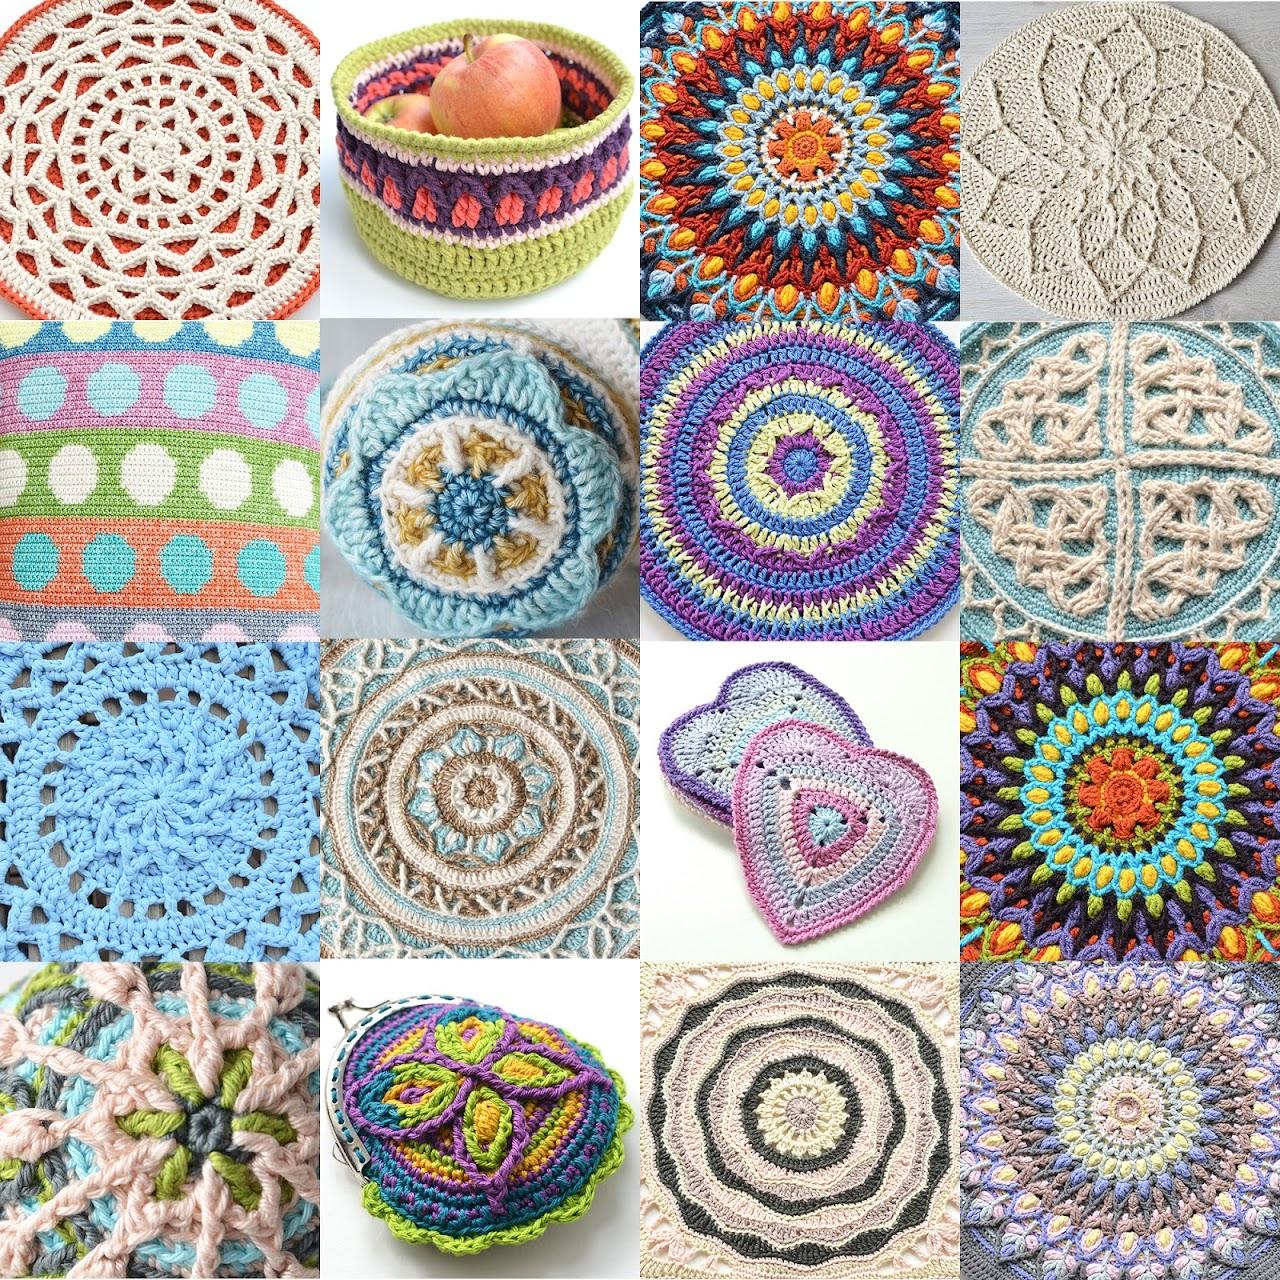 Original crochet designs by Lilla Bjorn. www.lillabjorncrochet.com